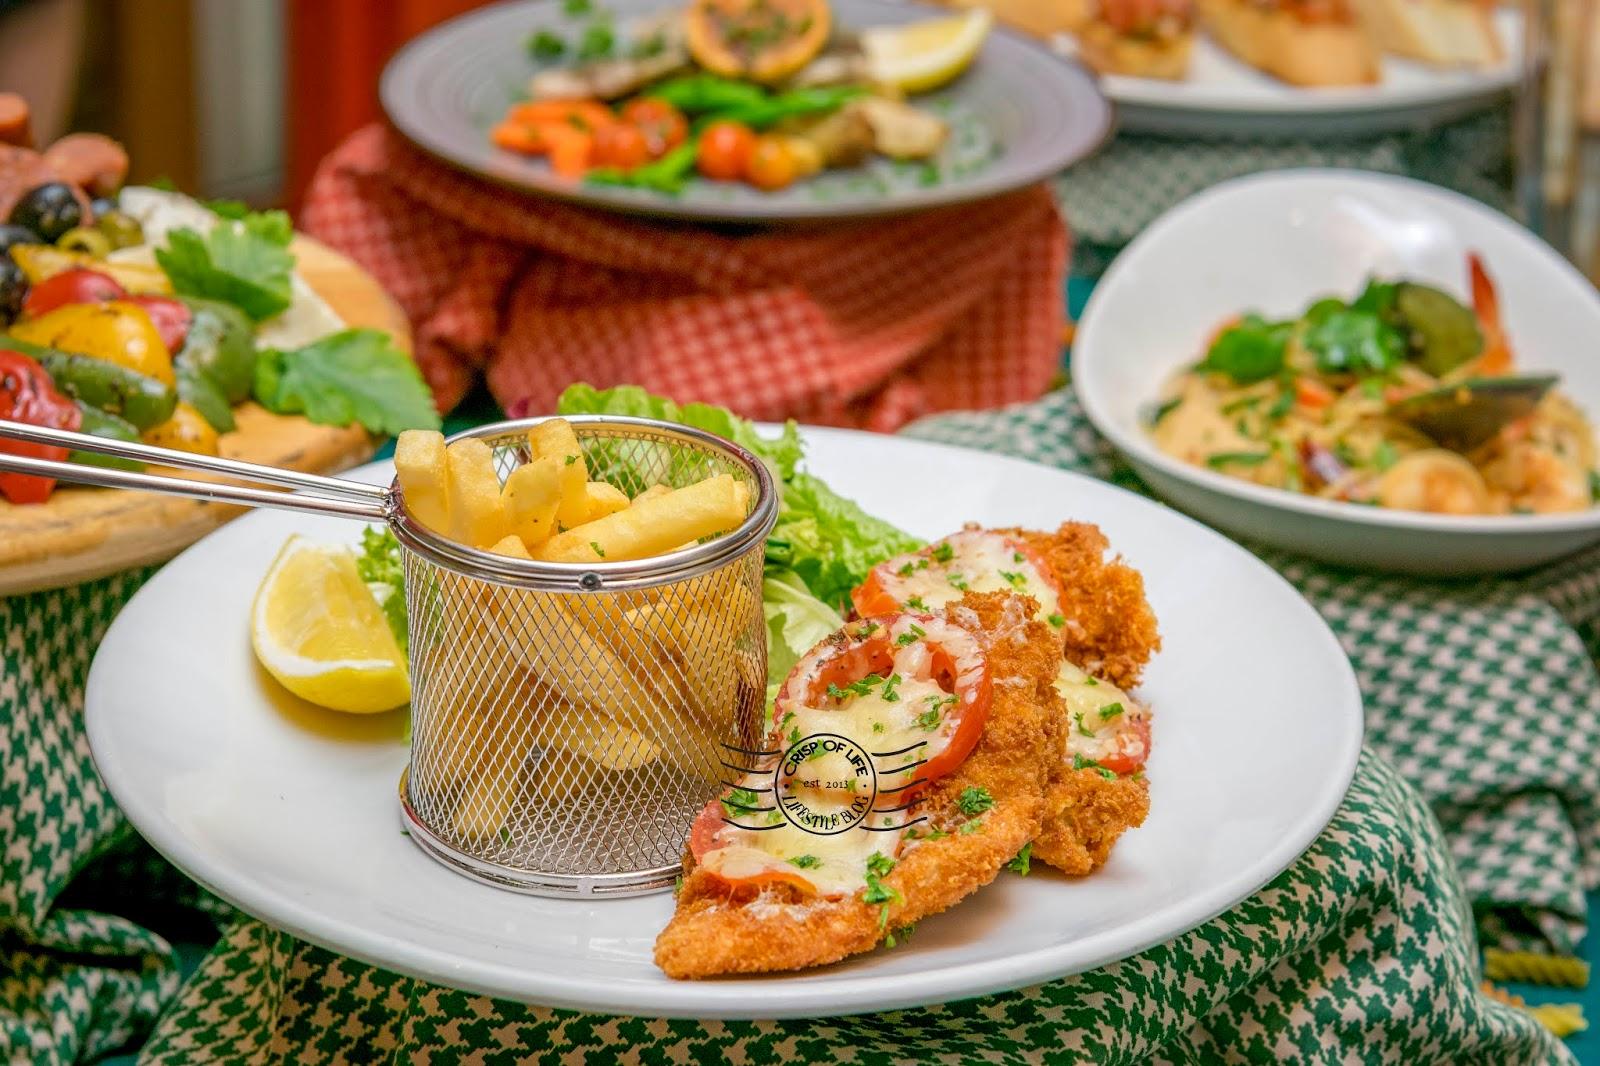 New Authentic Italian Cuisine Menu at Sigi's Bar & Grill Golden Sands Resort, Penang